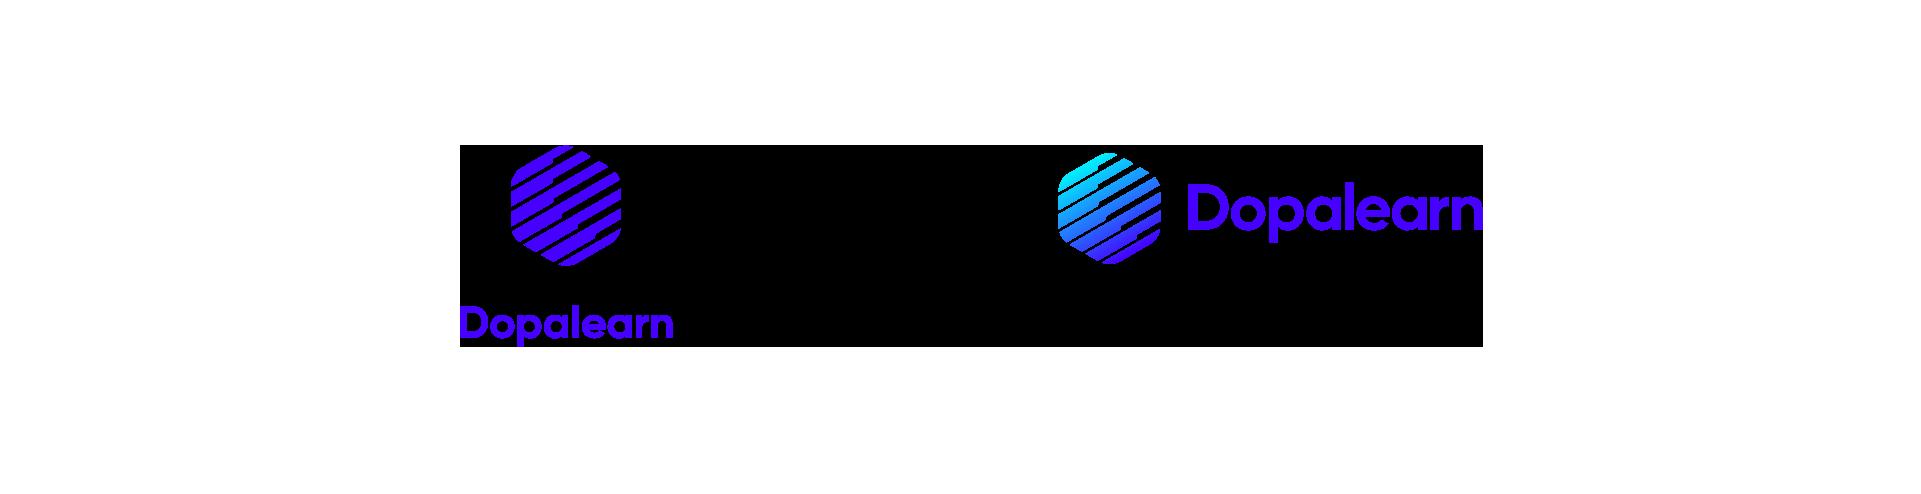 logoshowcase_04-1